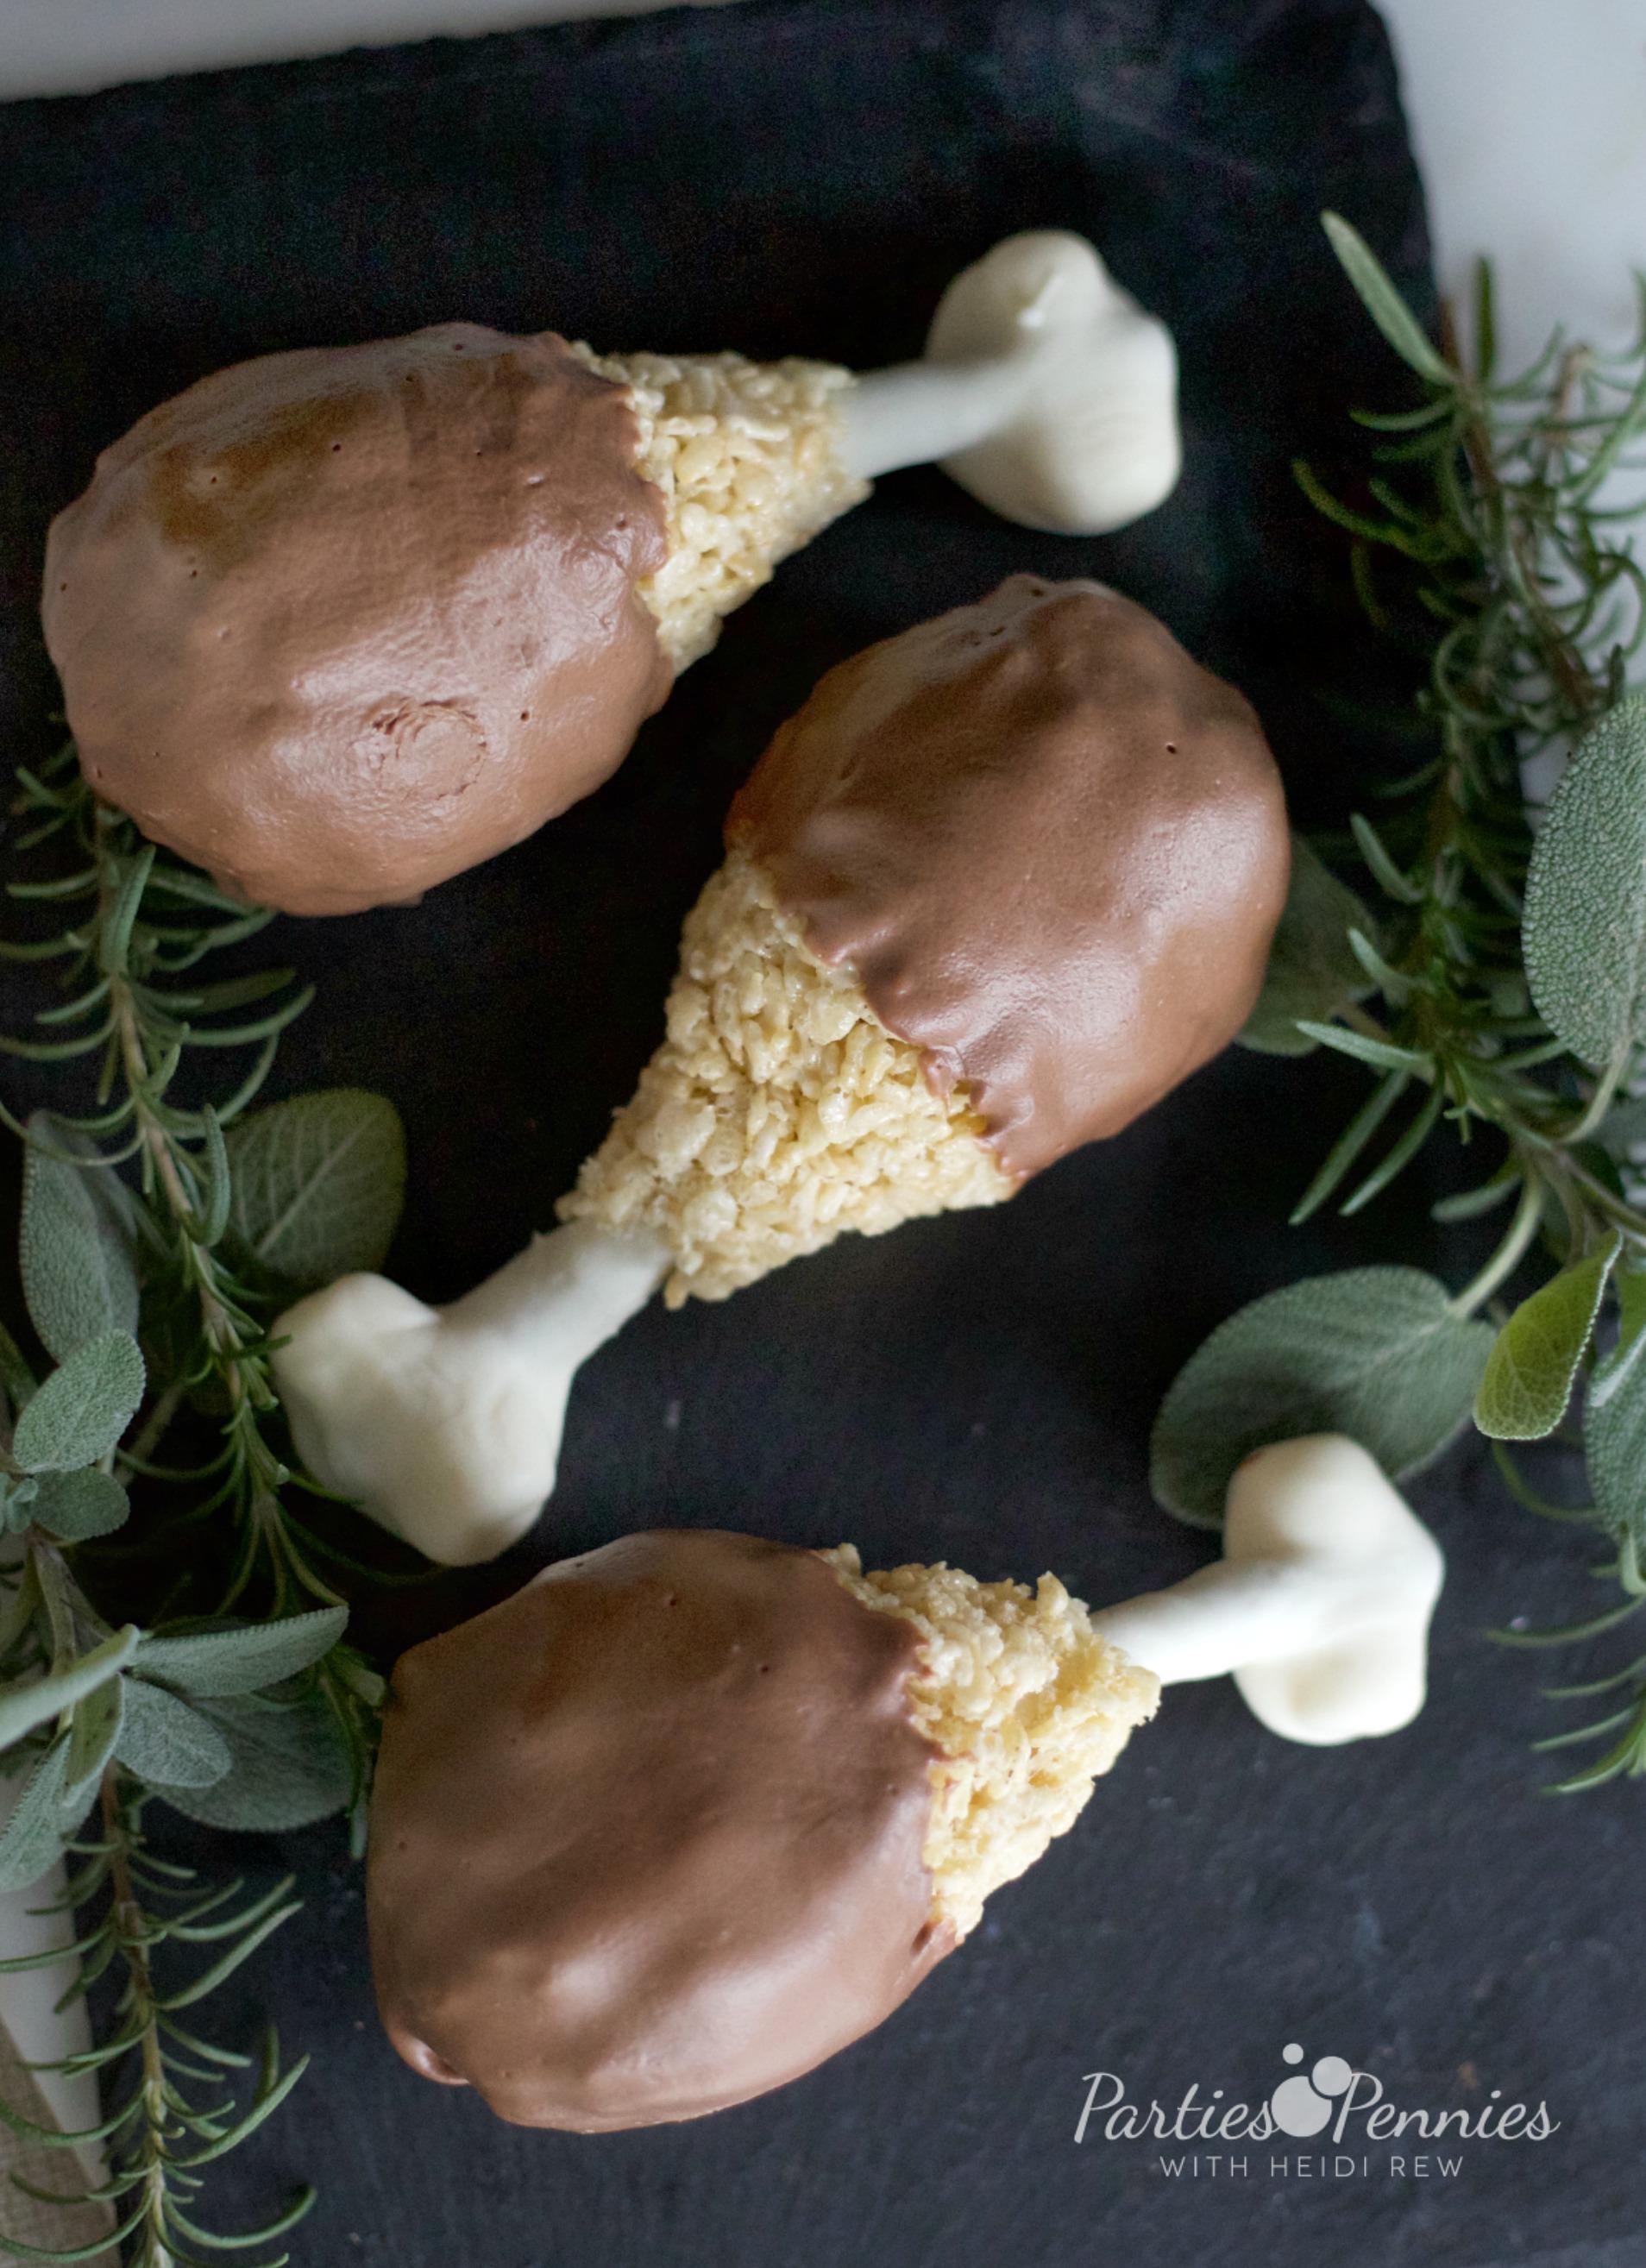 Turkey Leg Treat Recipe | PartiesforPennies.com | Rice Krispy Treat | #thankgiving #kids #dessert #videotutorial